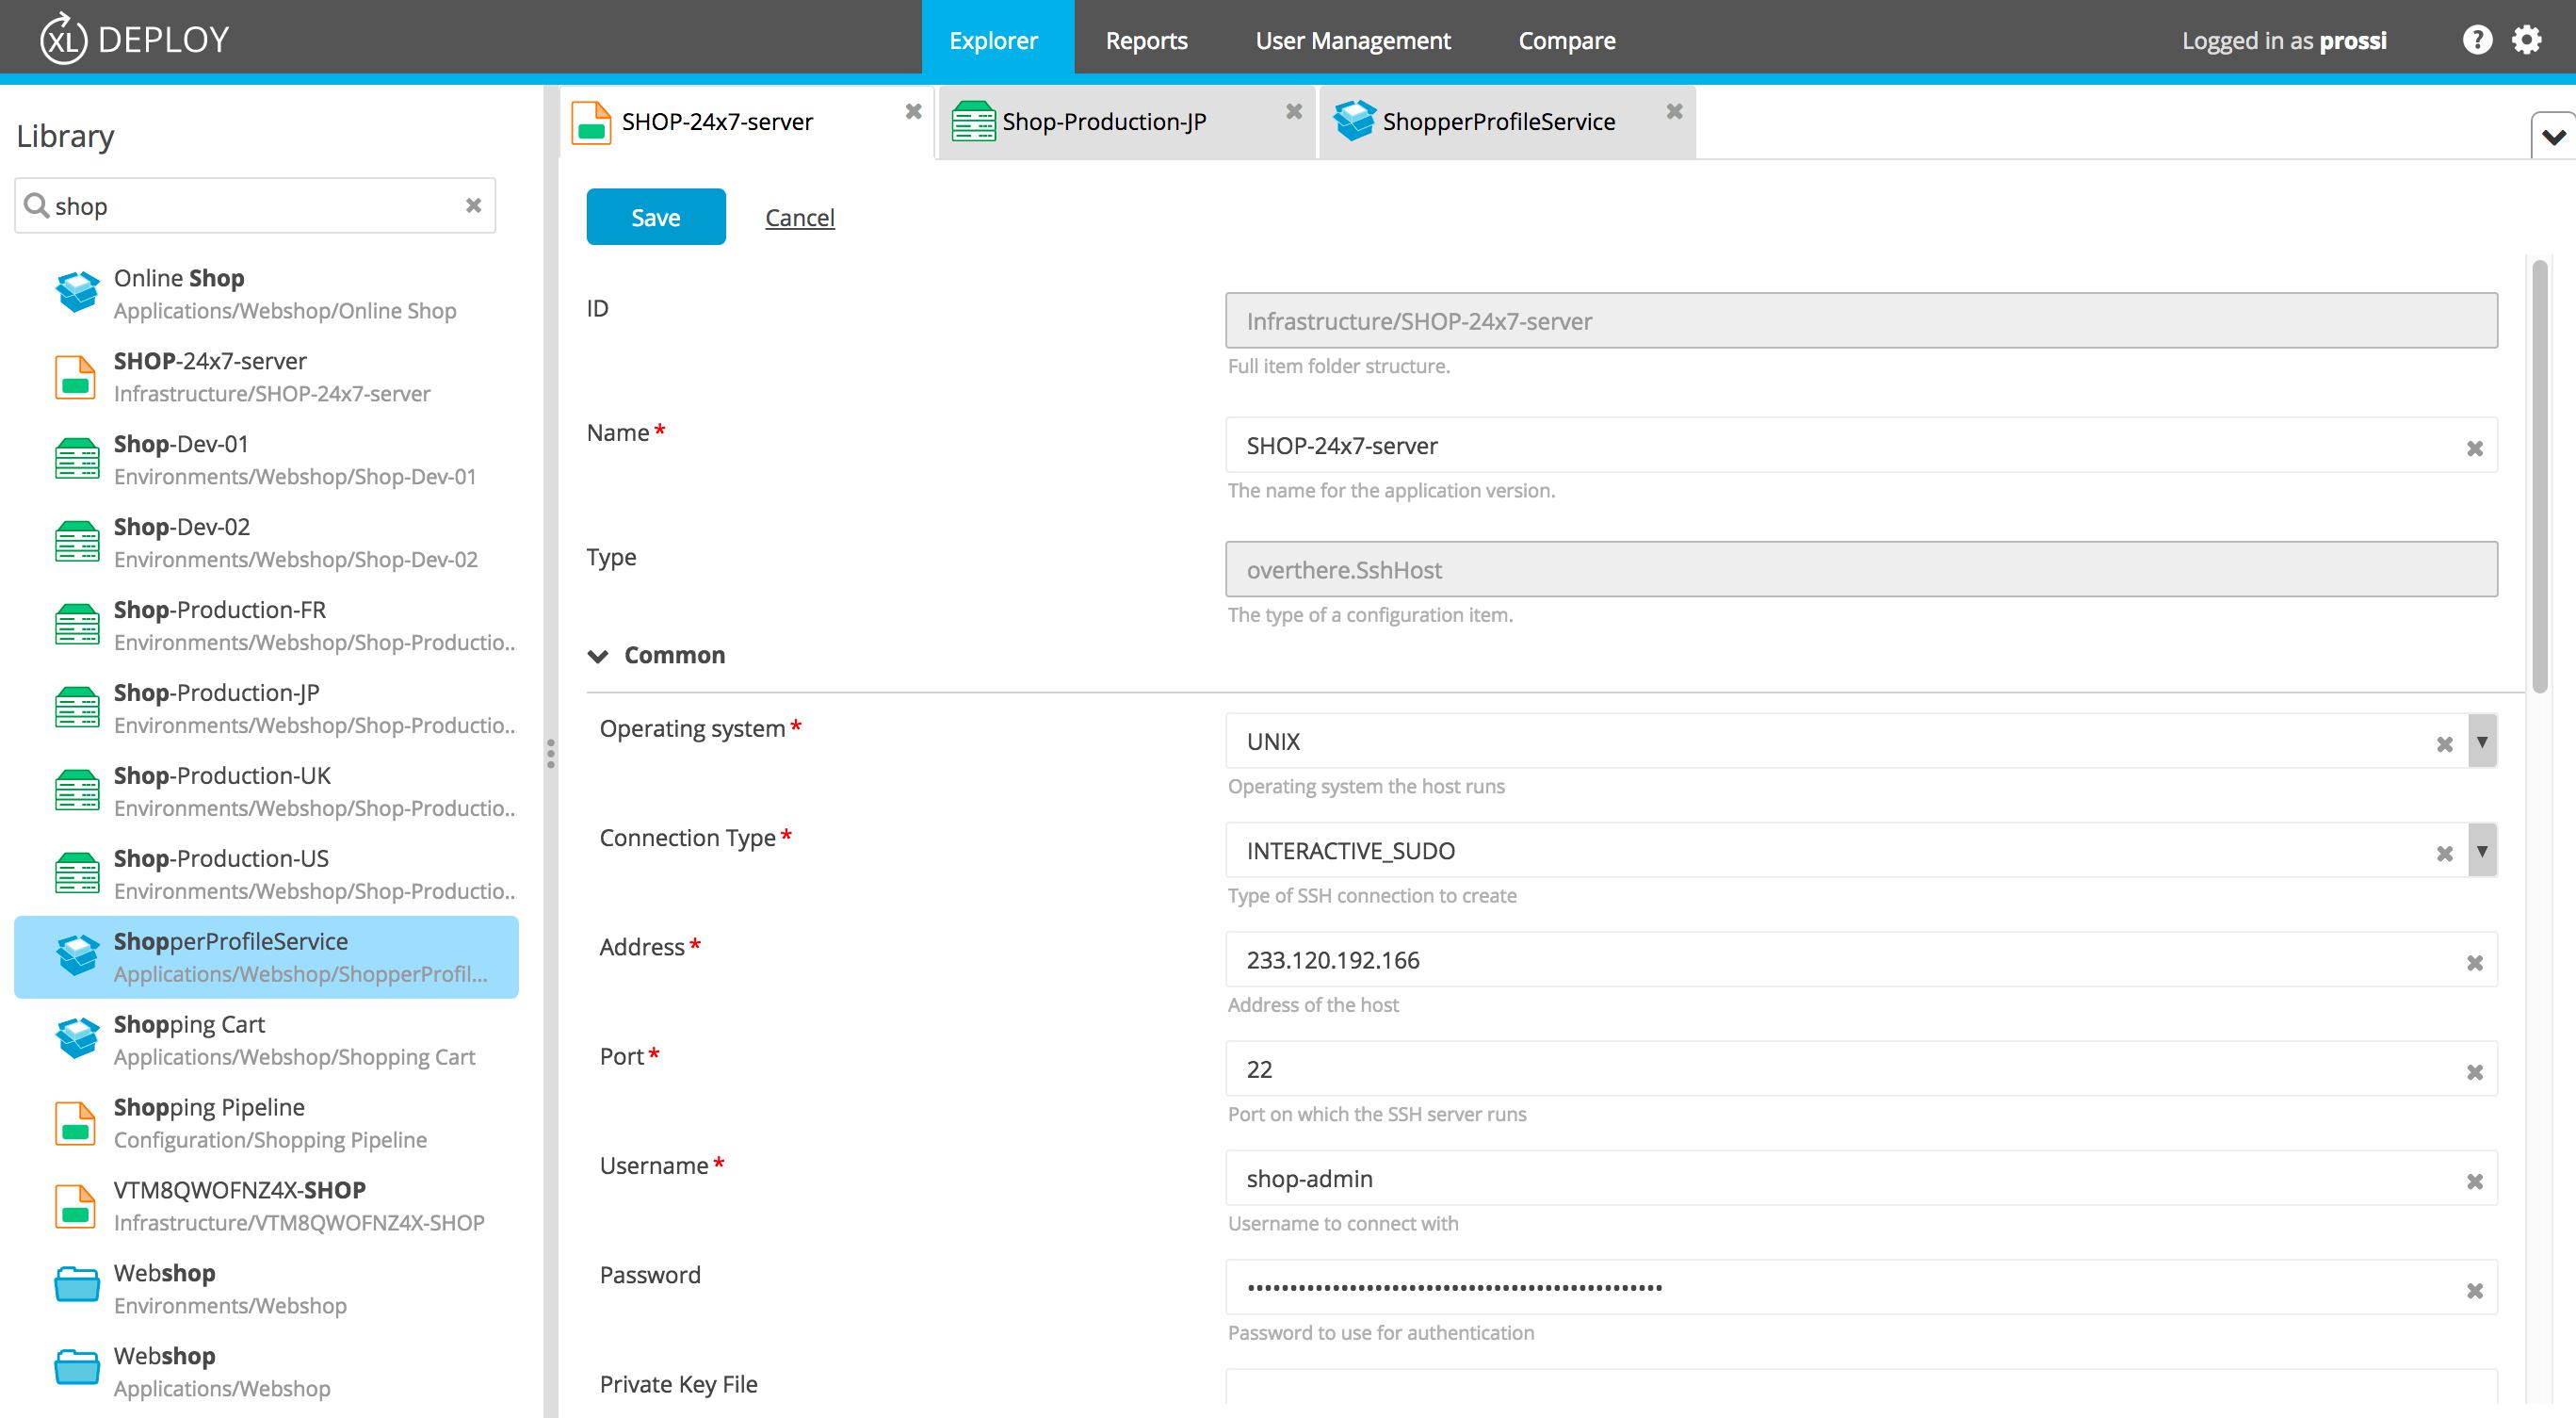 XL Deploy v7.0 Configuration Management